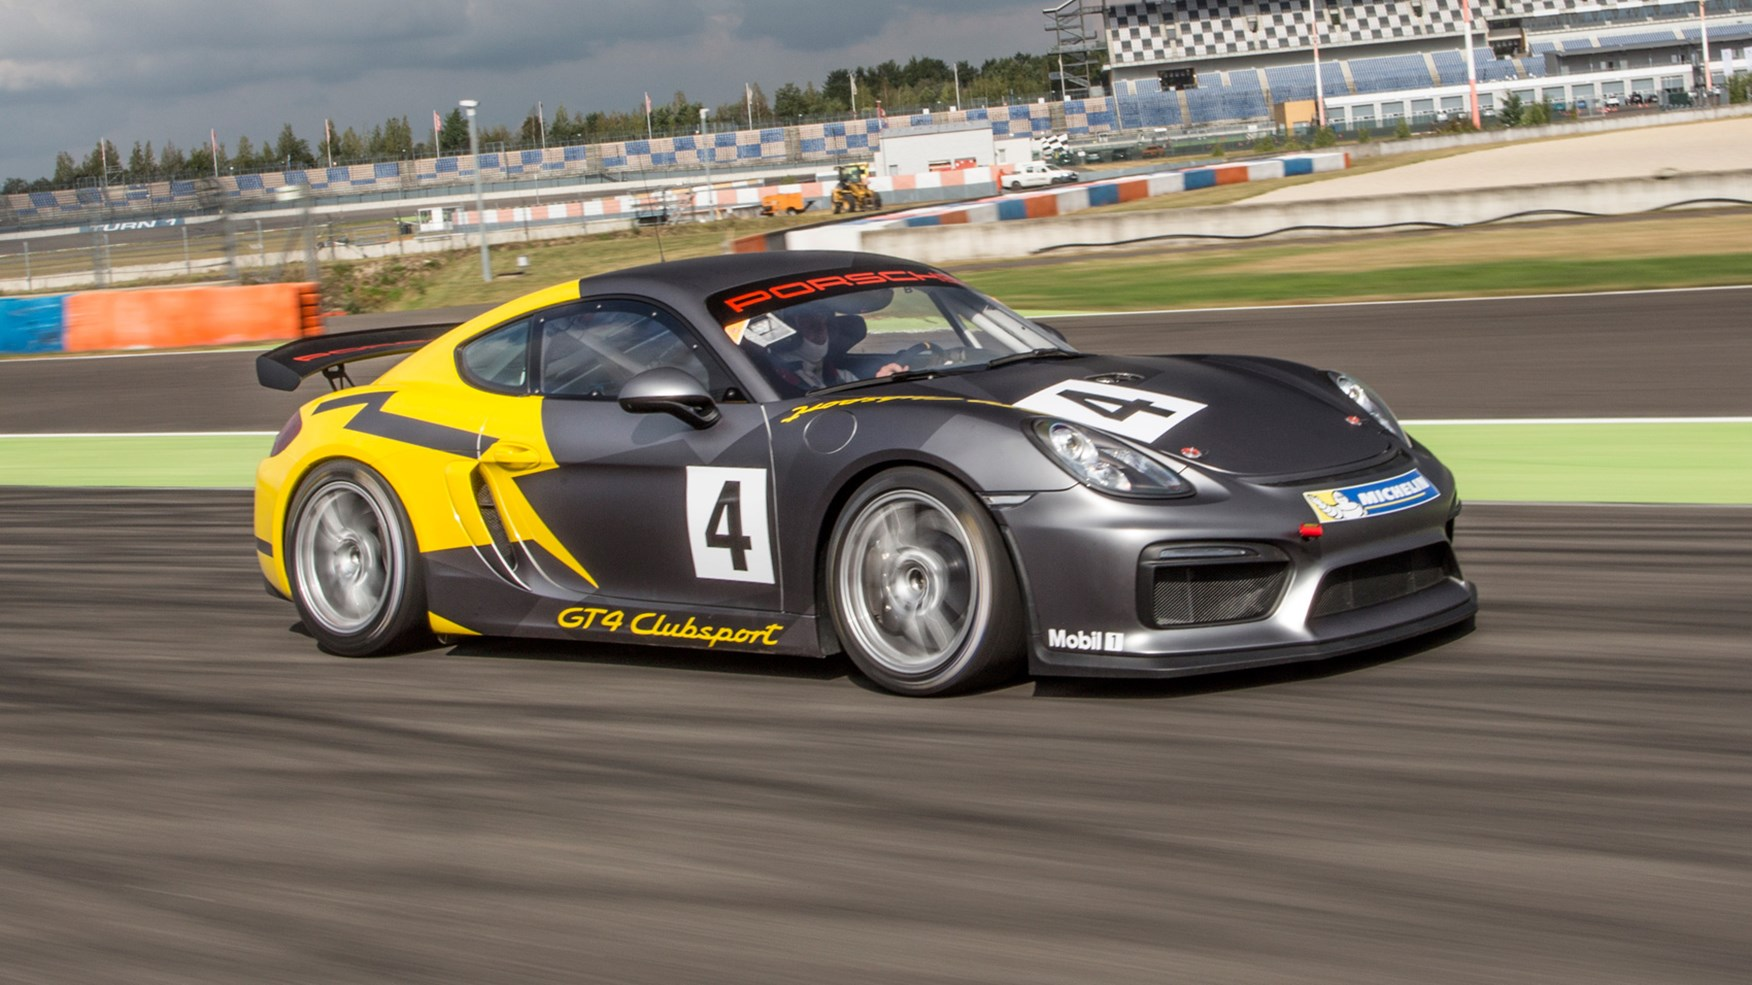 Cayman Clubsport For Sale >> Porsche Cayman GT4 Clubsport (2017) review by CAR Magazine